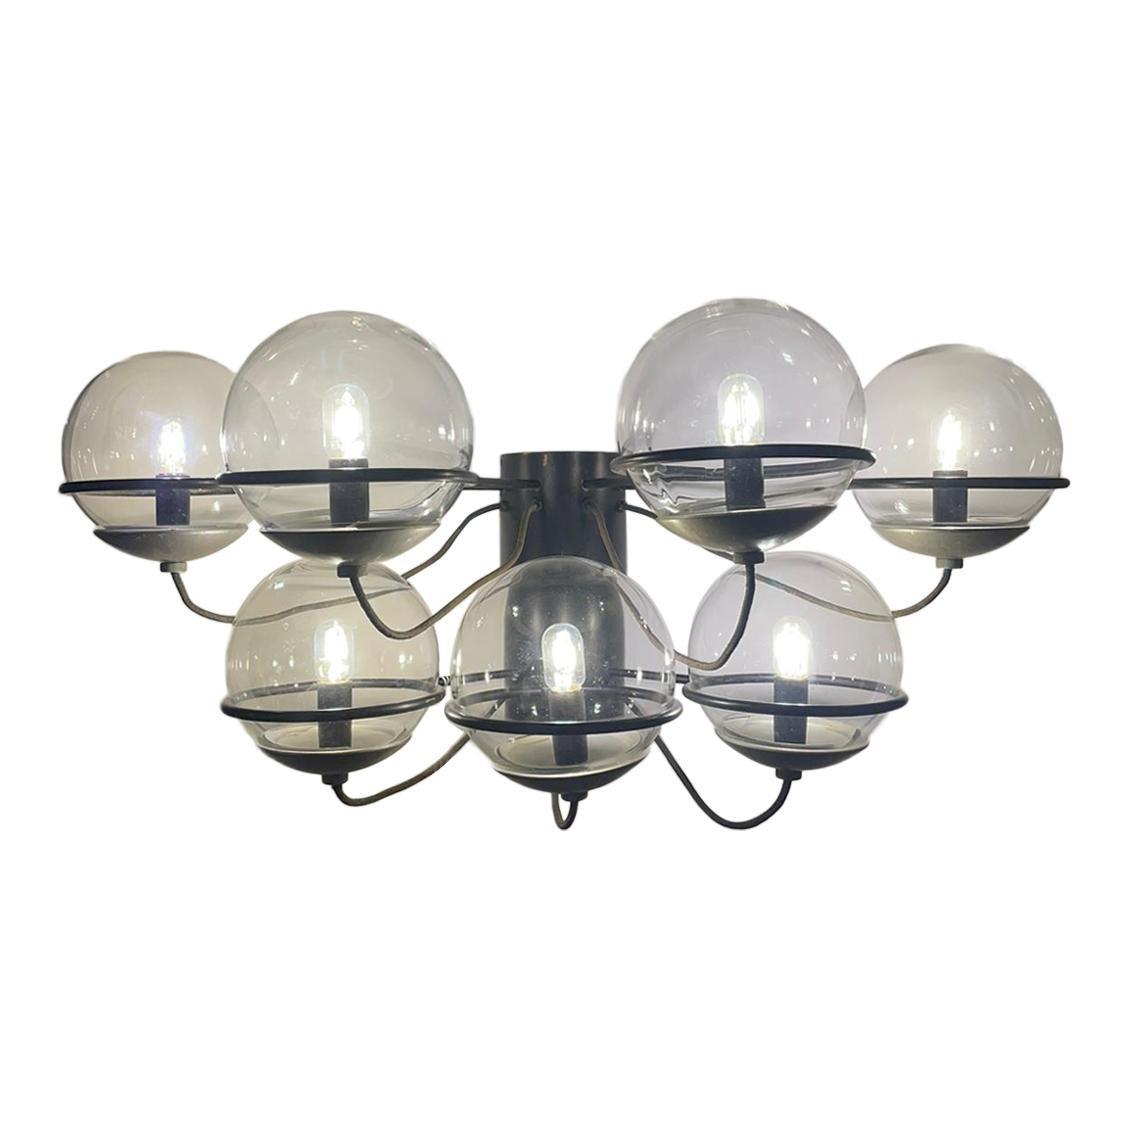 Gino Sarfatti Arteluce Mod. 237/7 Wall Light Lacquered Metal Glass, Italy, 1959